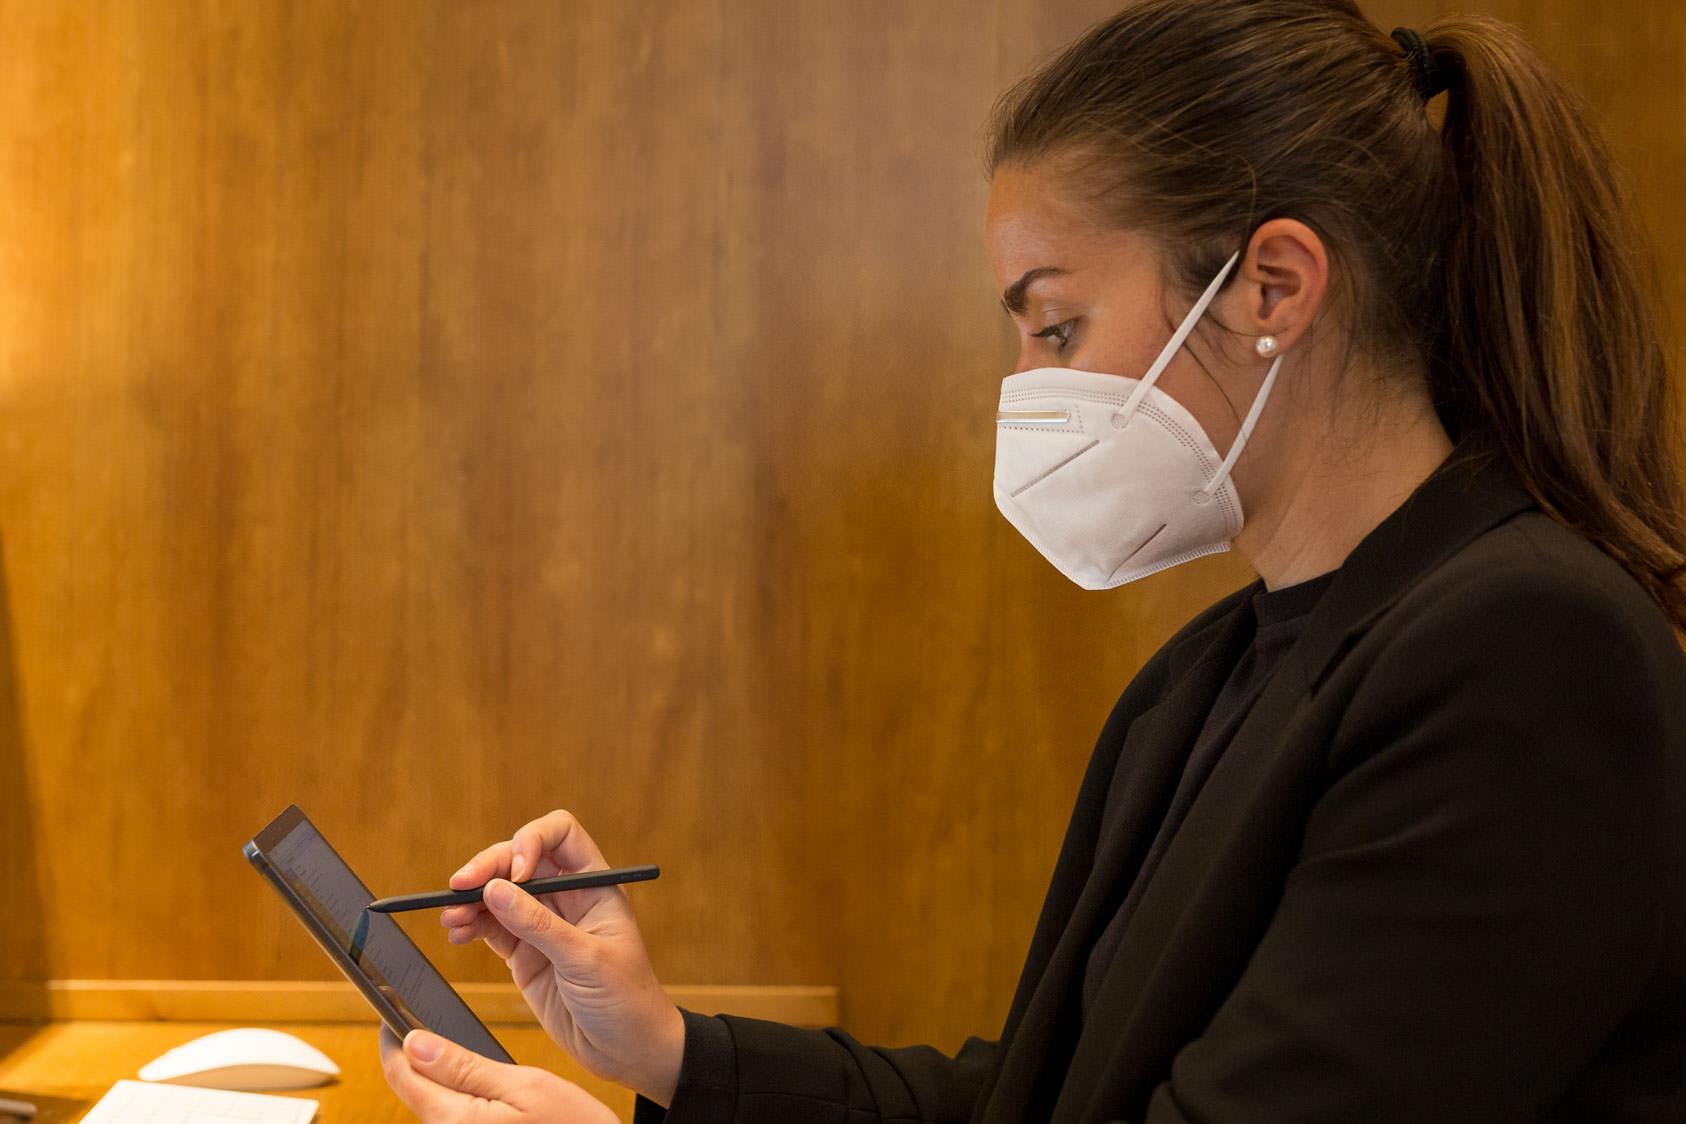 clinica dental sostenible